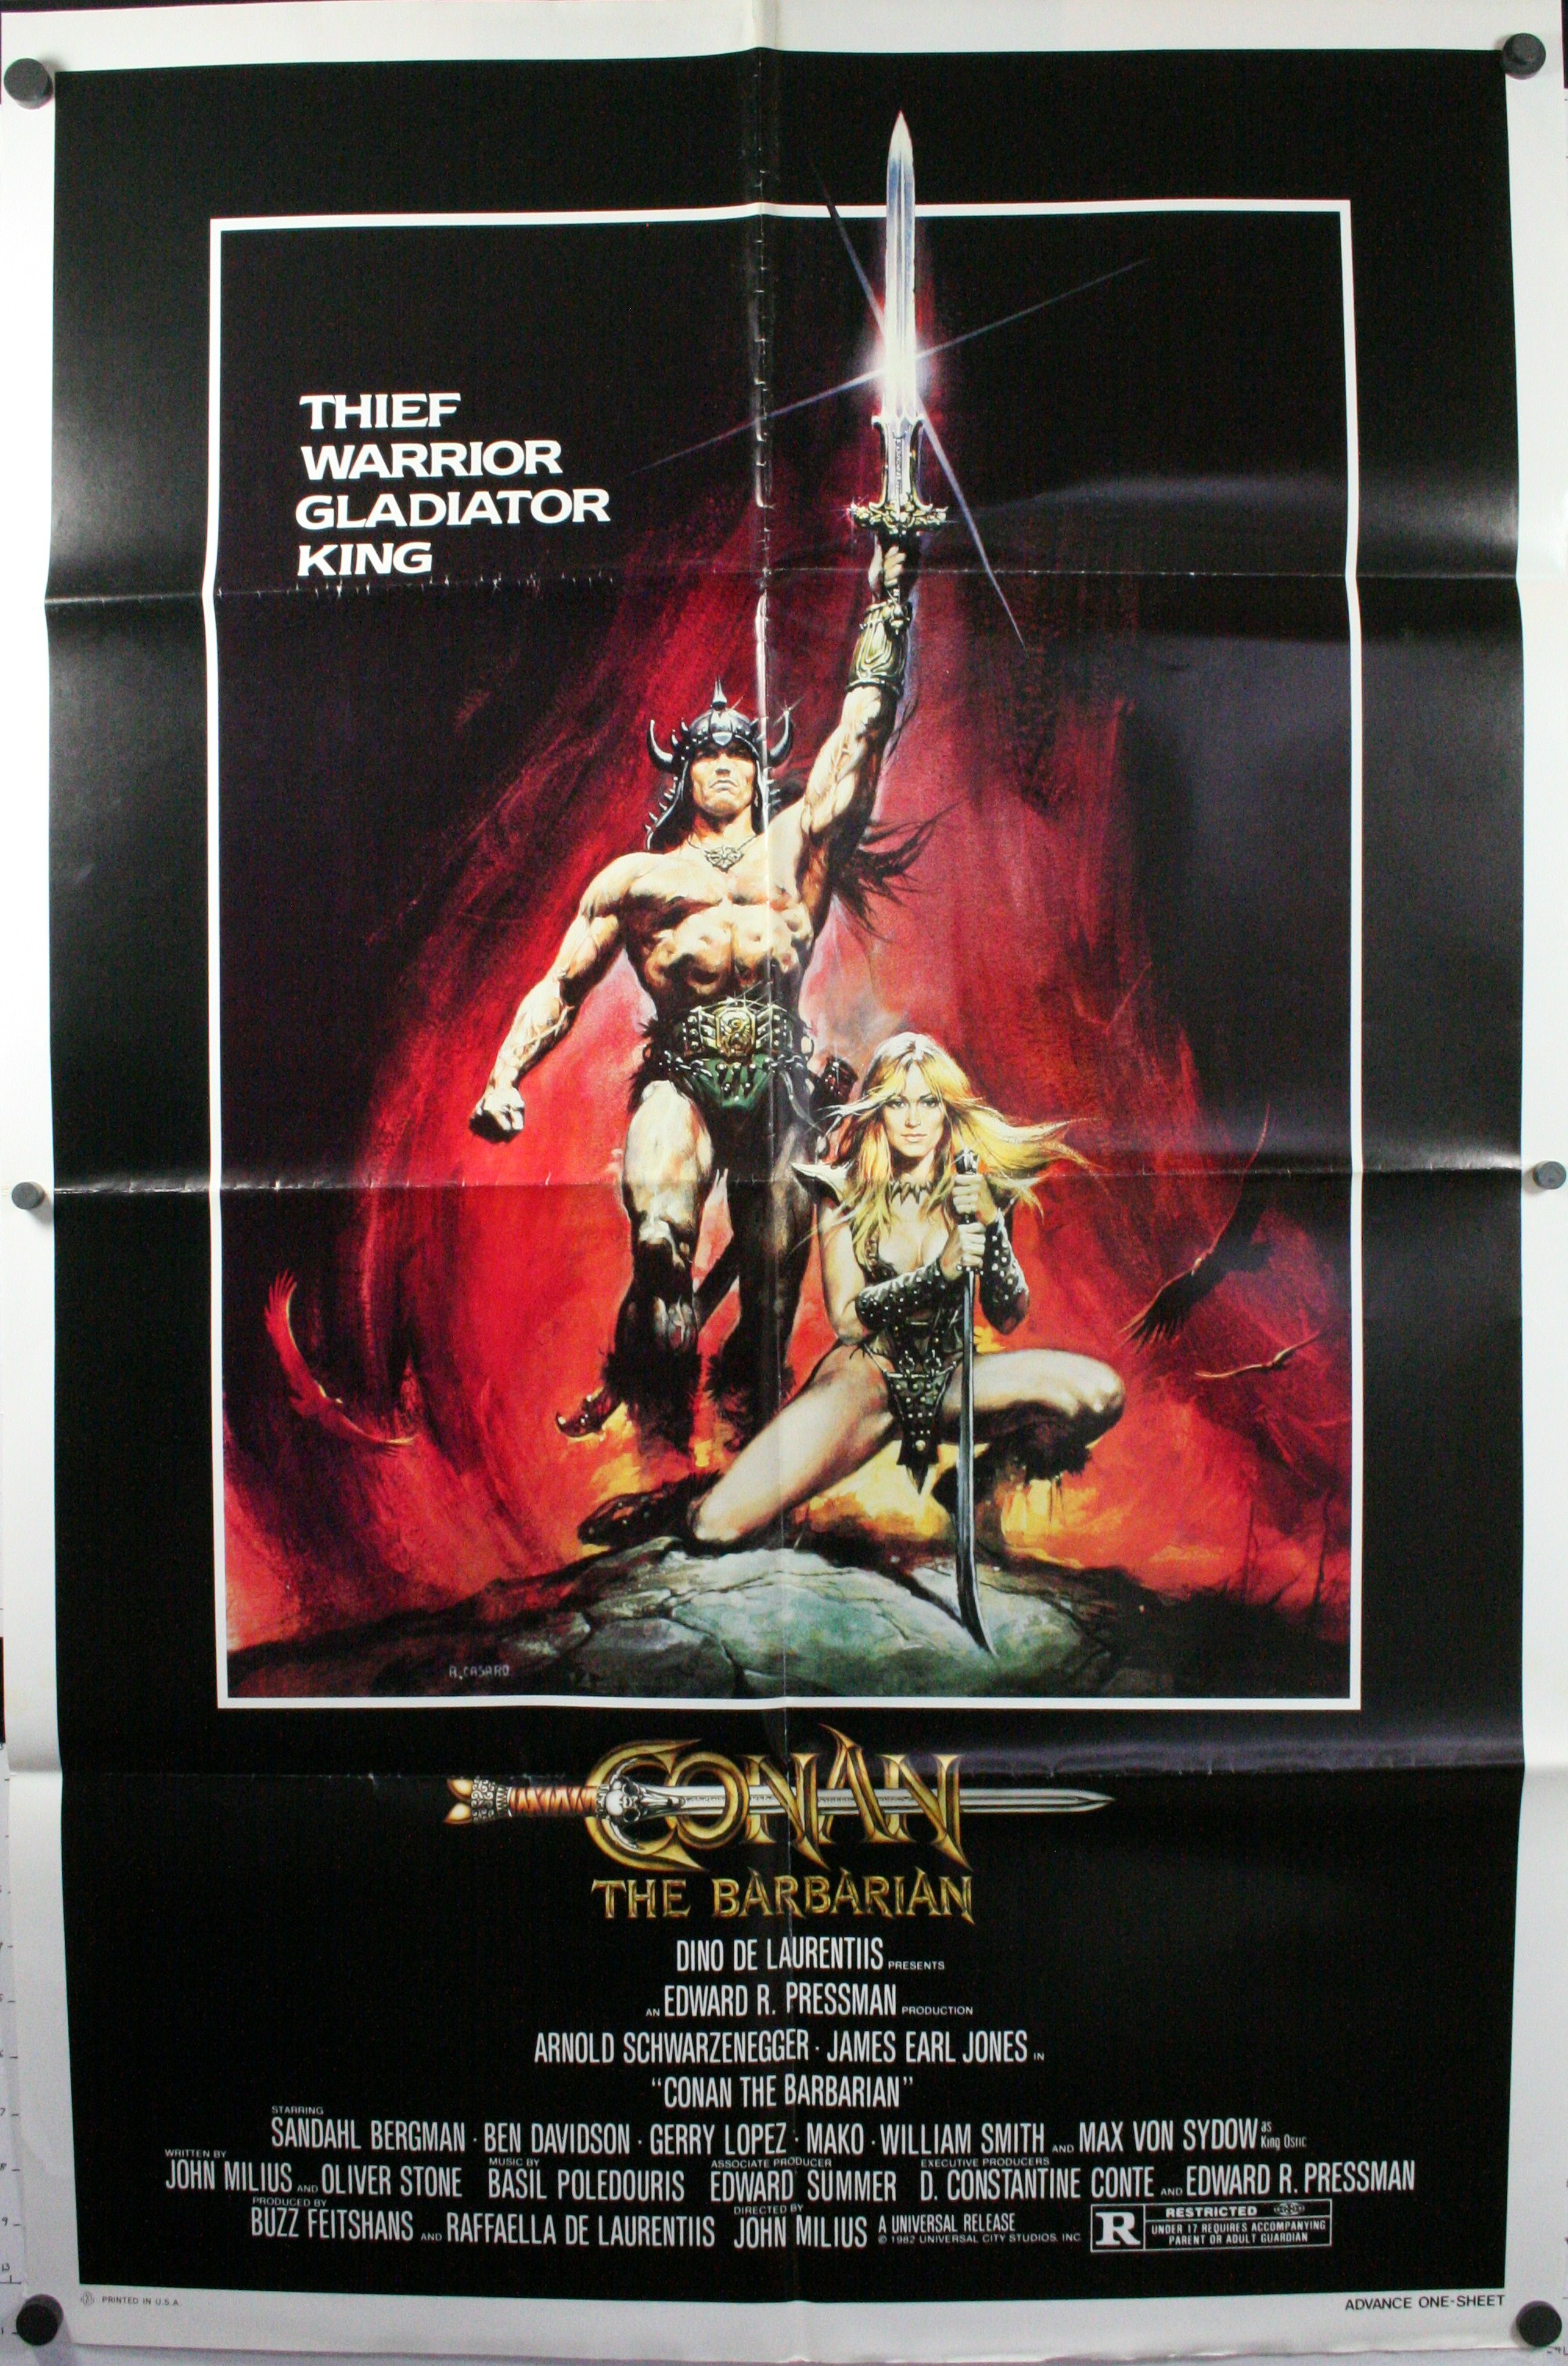 Conan The Barbarian 1982 Original Advance 1 Sheet Movie Poster Starring Arnold Schwarzenegger And James